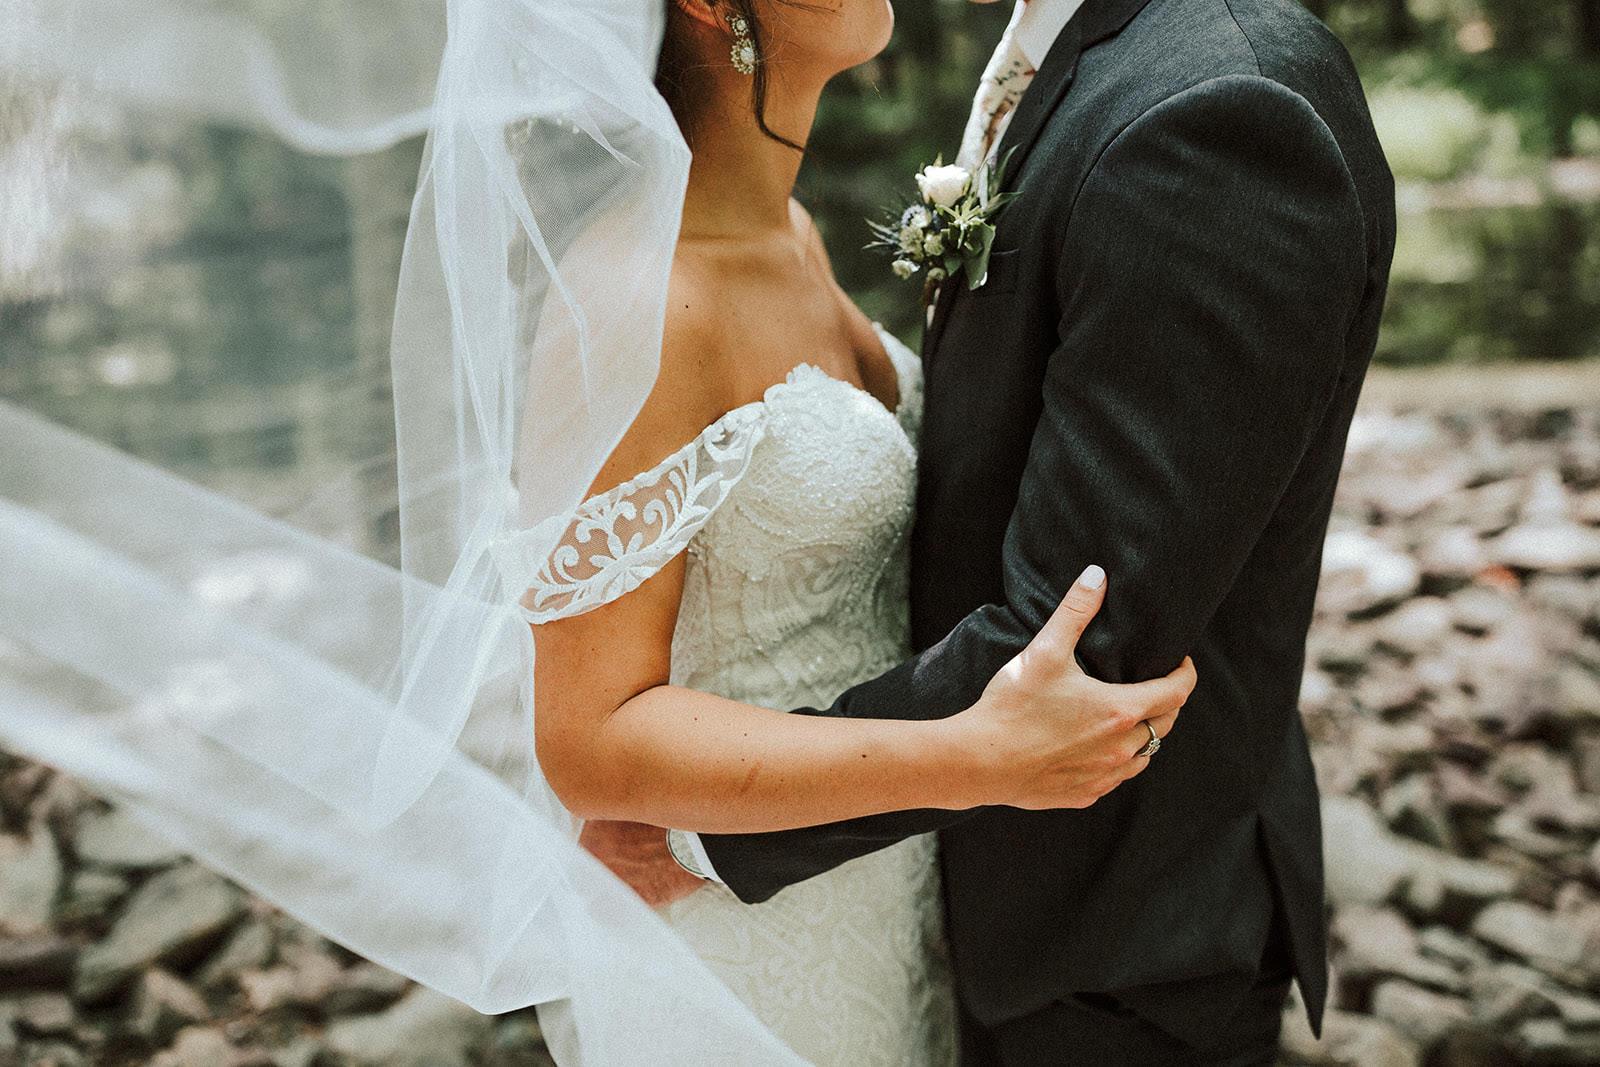 ivory-and-beau-wedding-dress-bridal-boutique-breanna-wedding-2.jpg